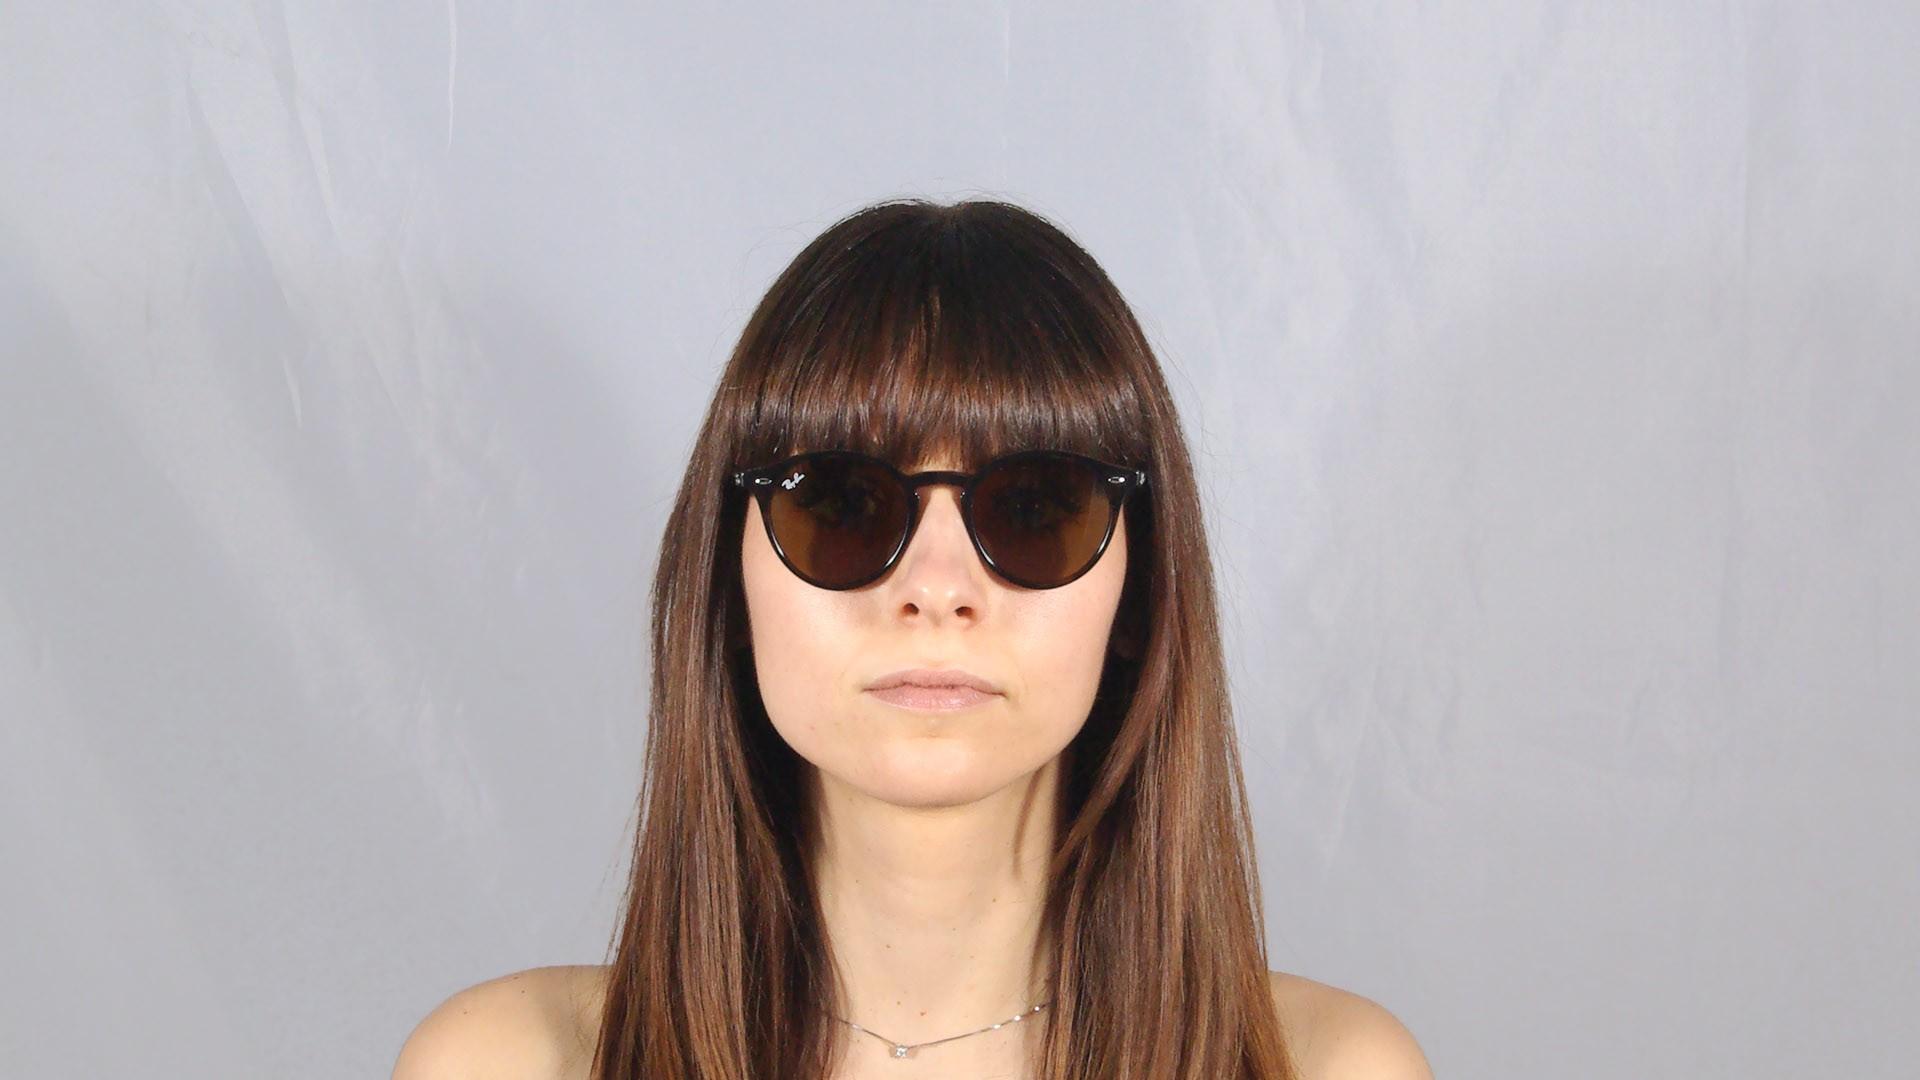 bca6ee8966 Sunglasses Ray-Ban RB2180 710 73 49-21 Tortoise Medium